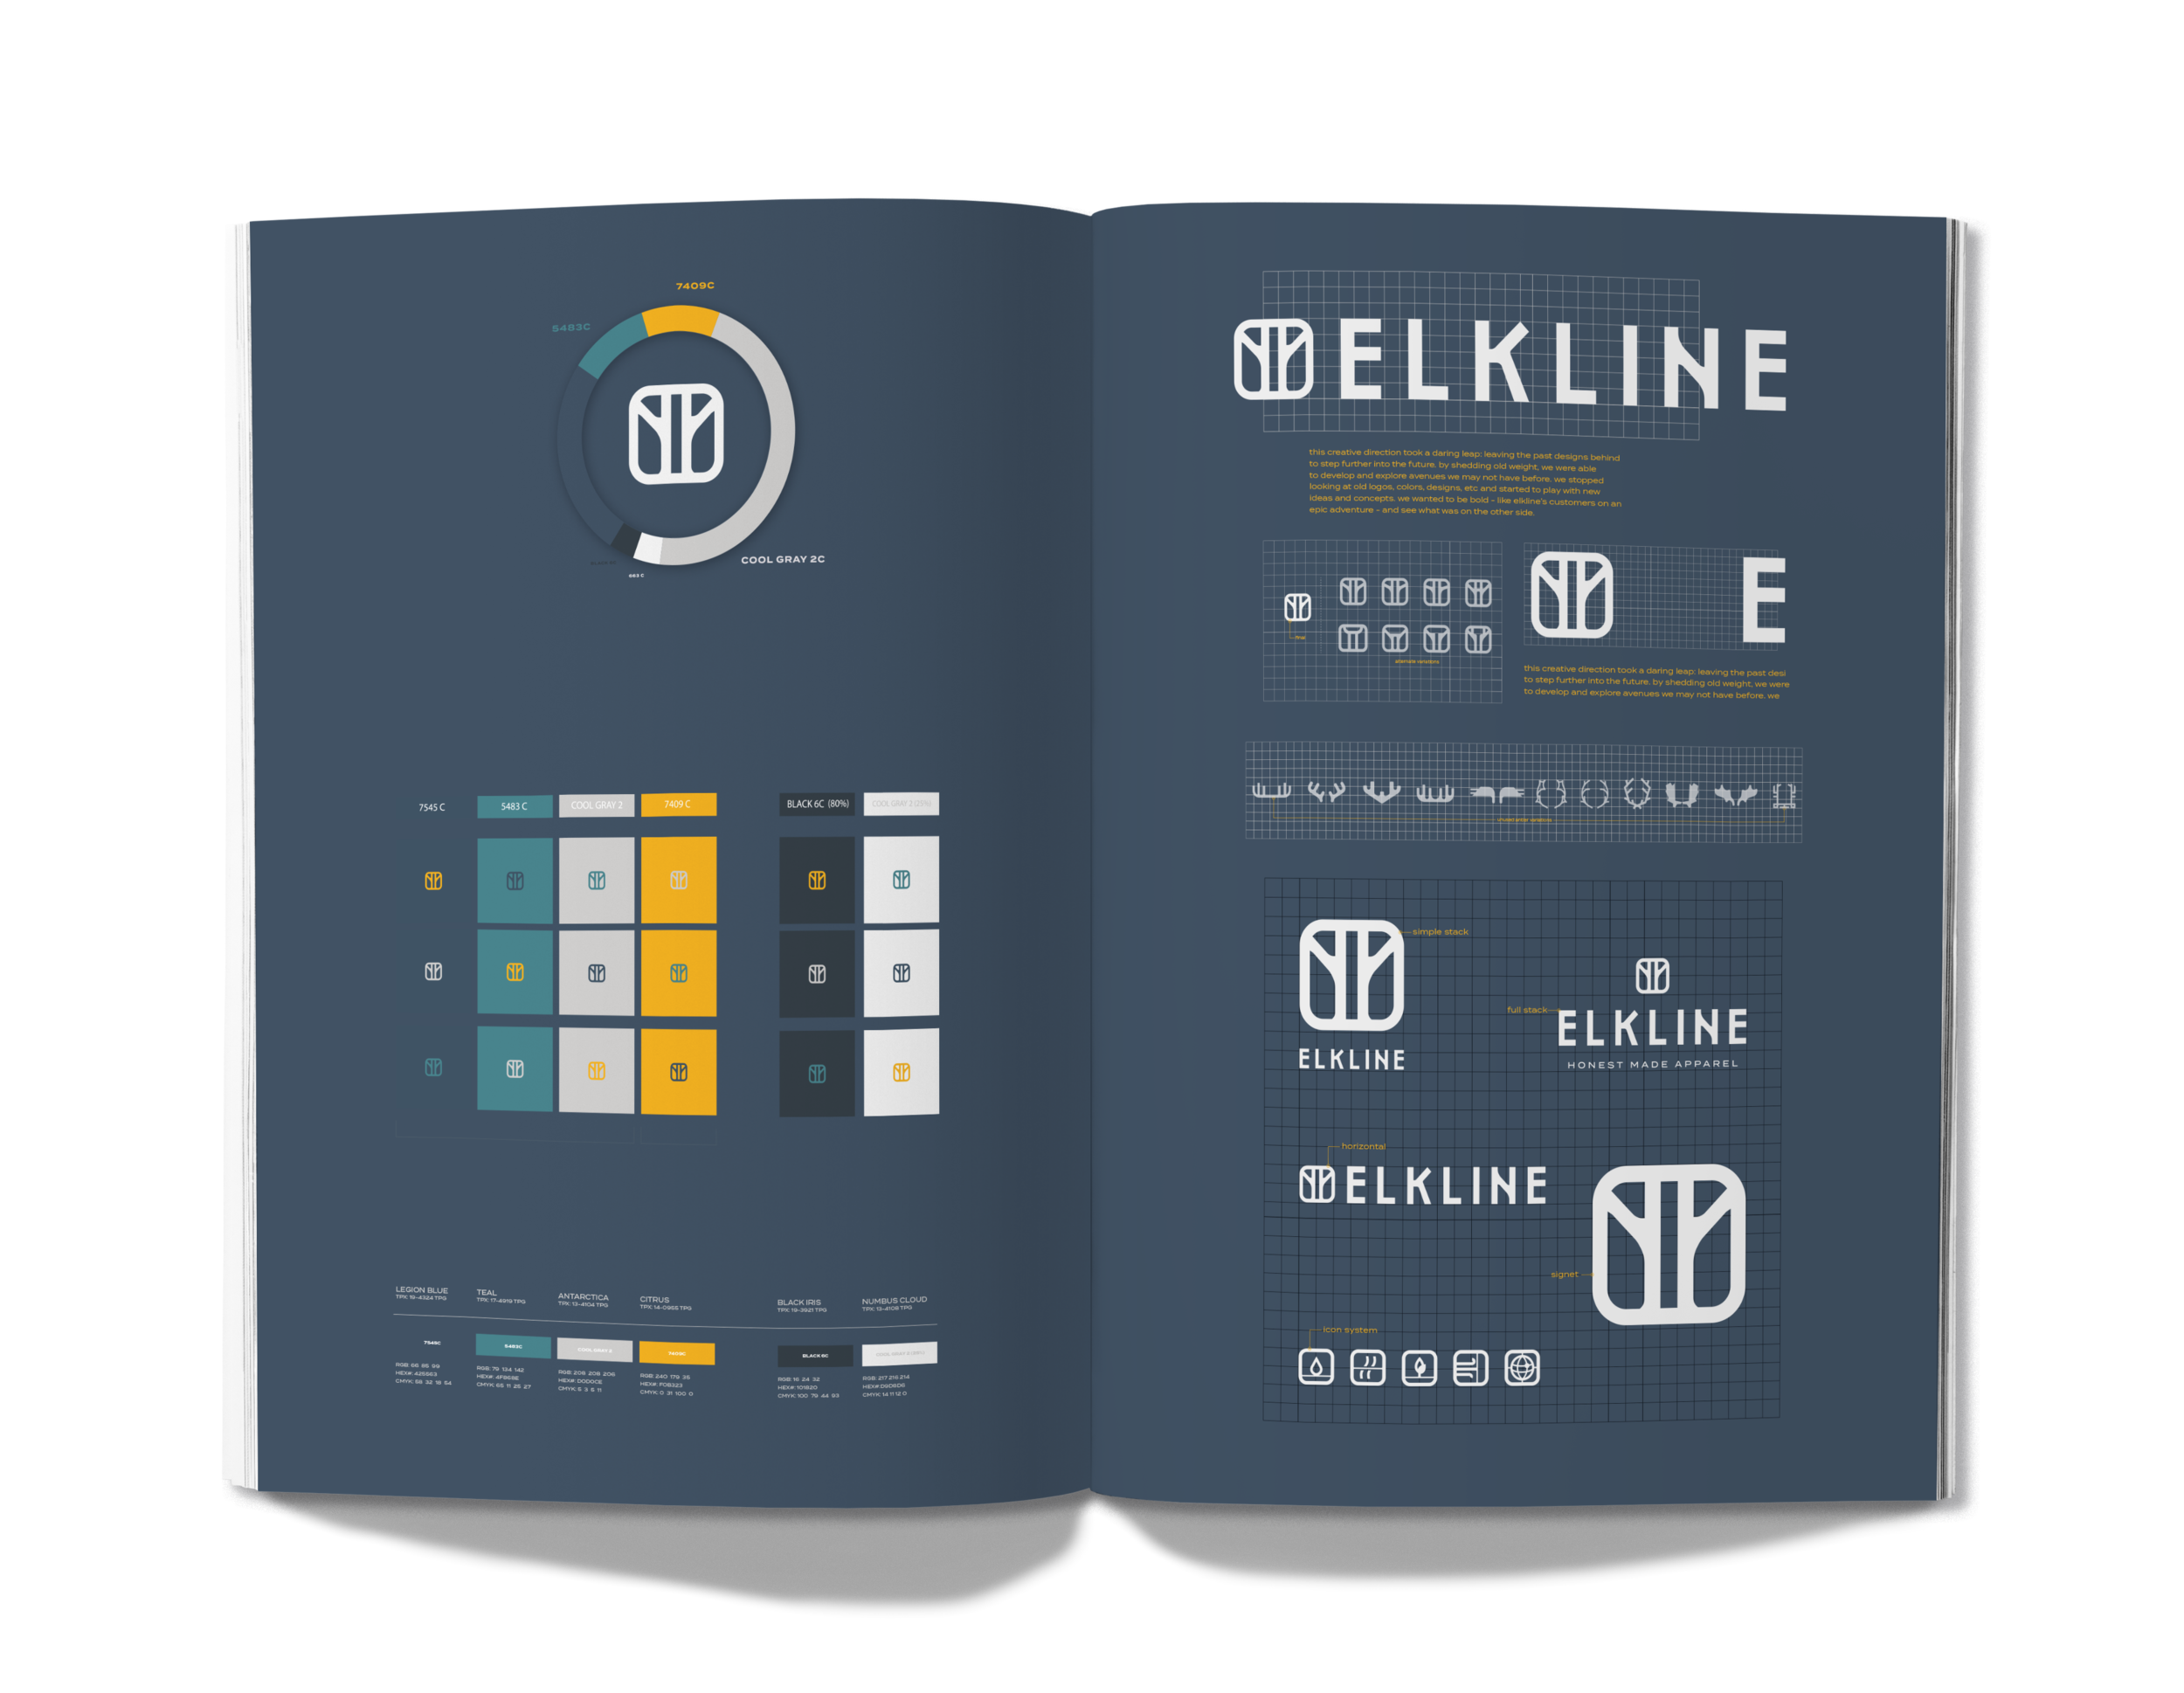 ELKLINE, Outdoor Fashion Apparel Brand, Branding Manual Design Layout